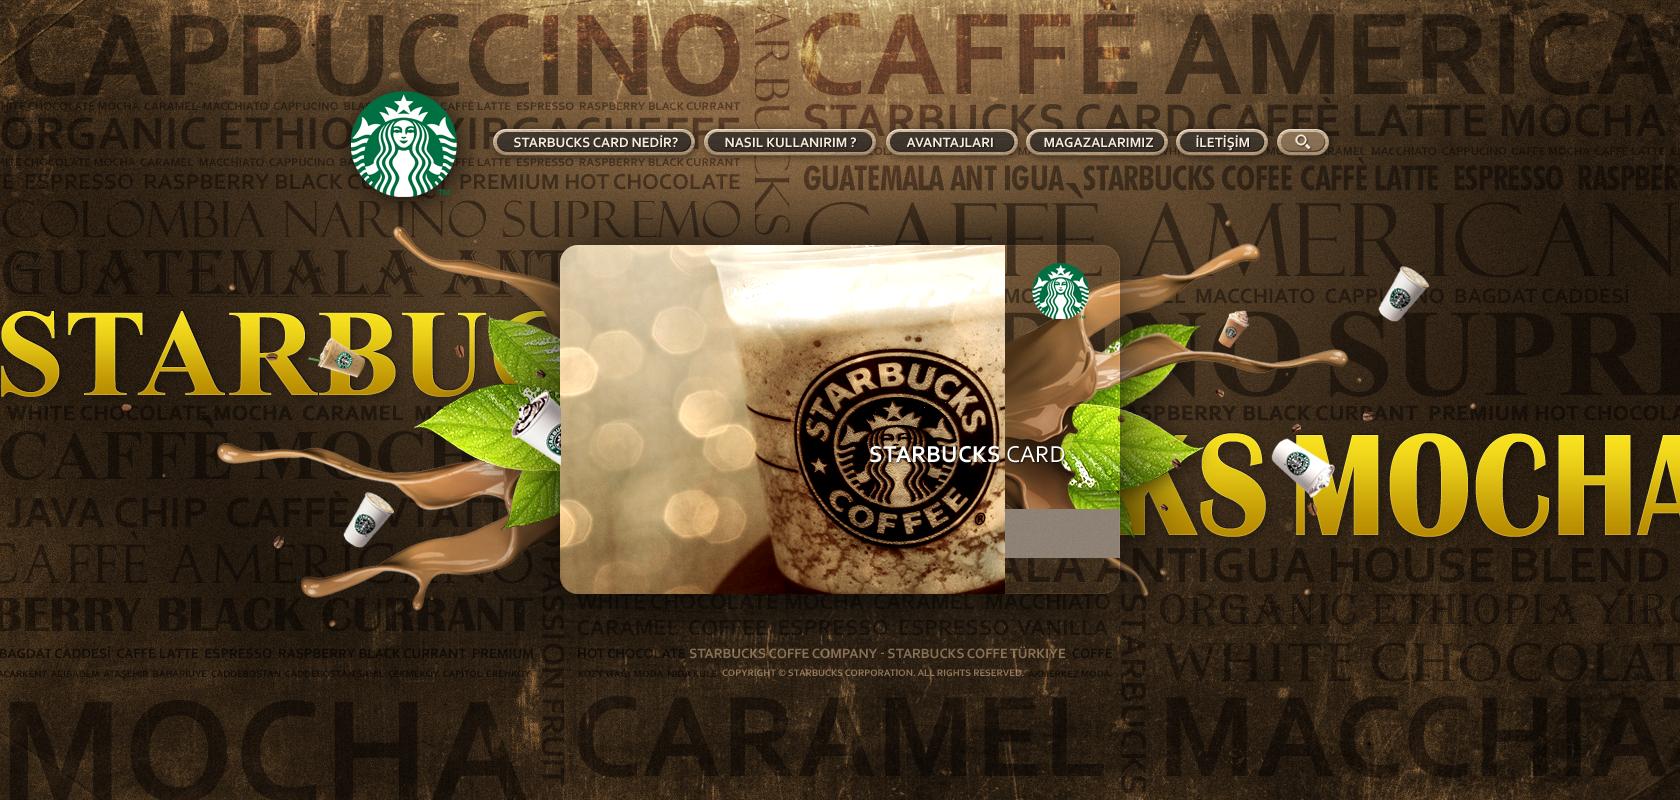 Tayfun Geçim / Projects / Starbucks Card | Dribbble